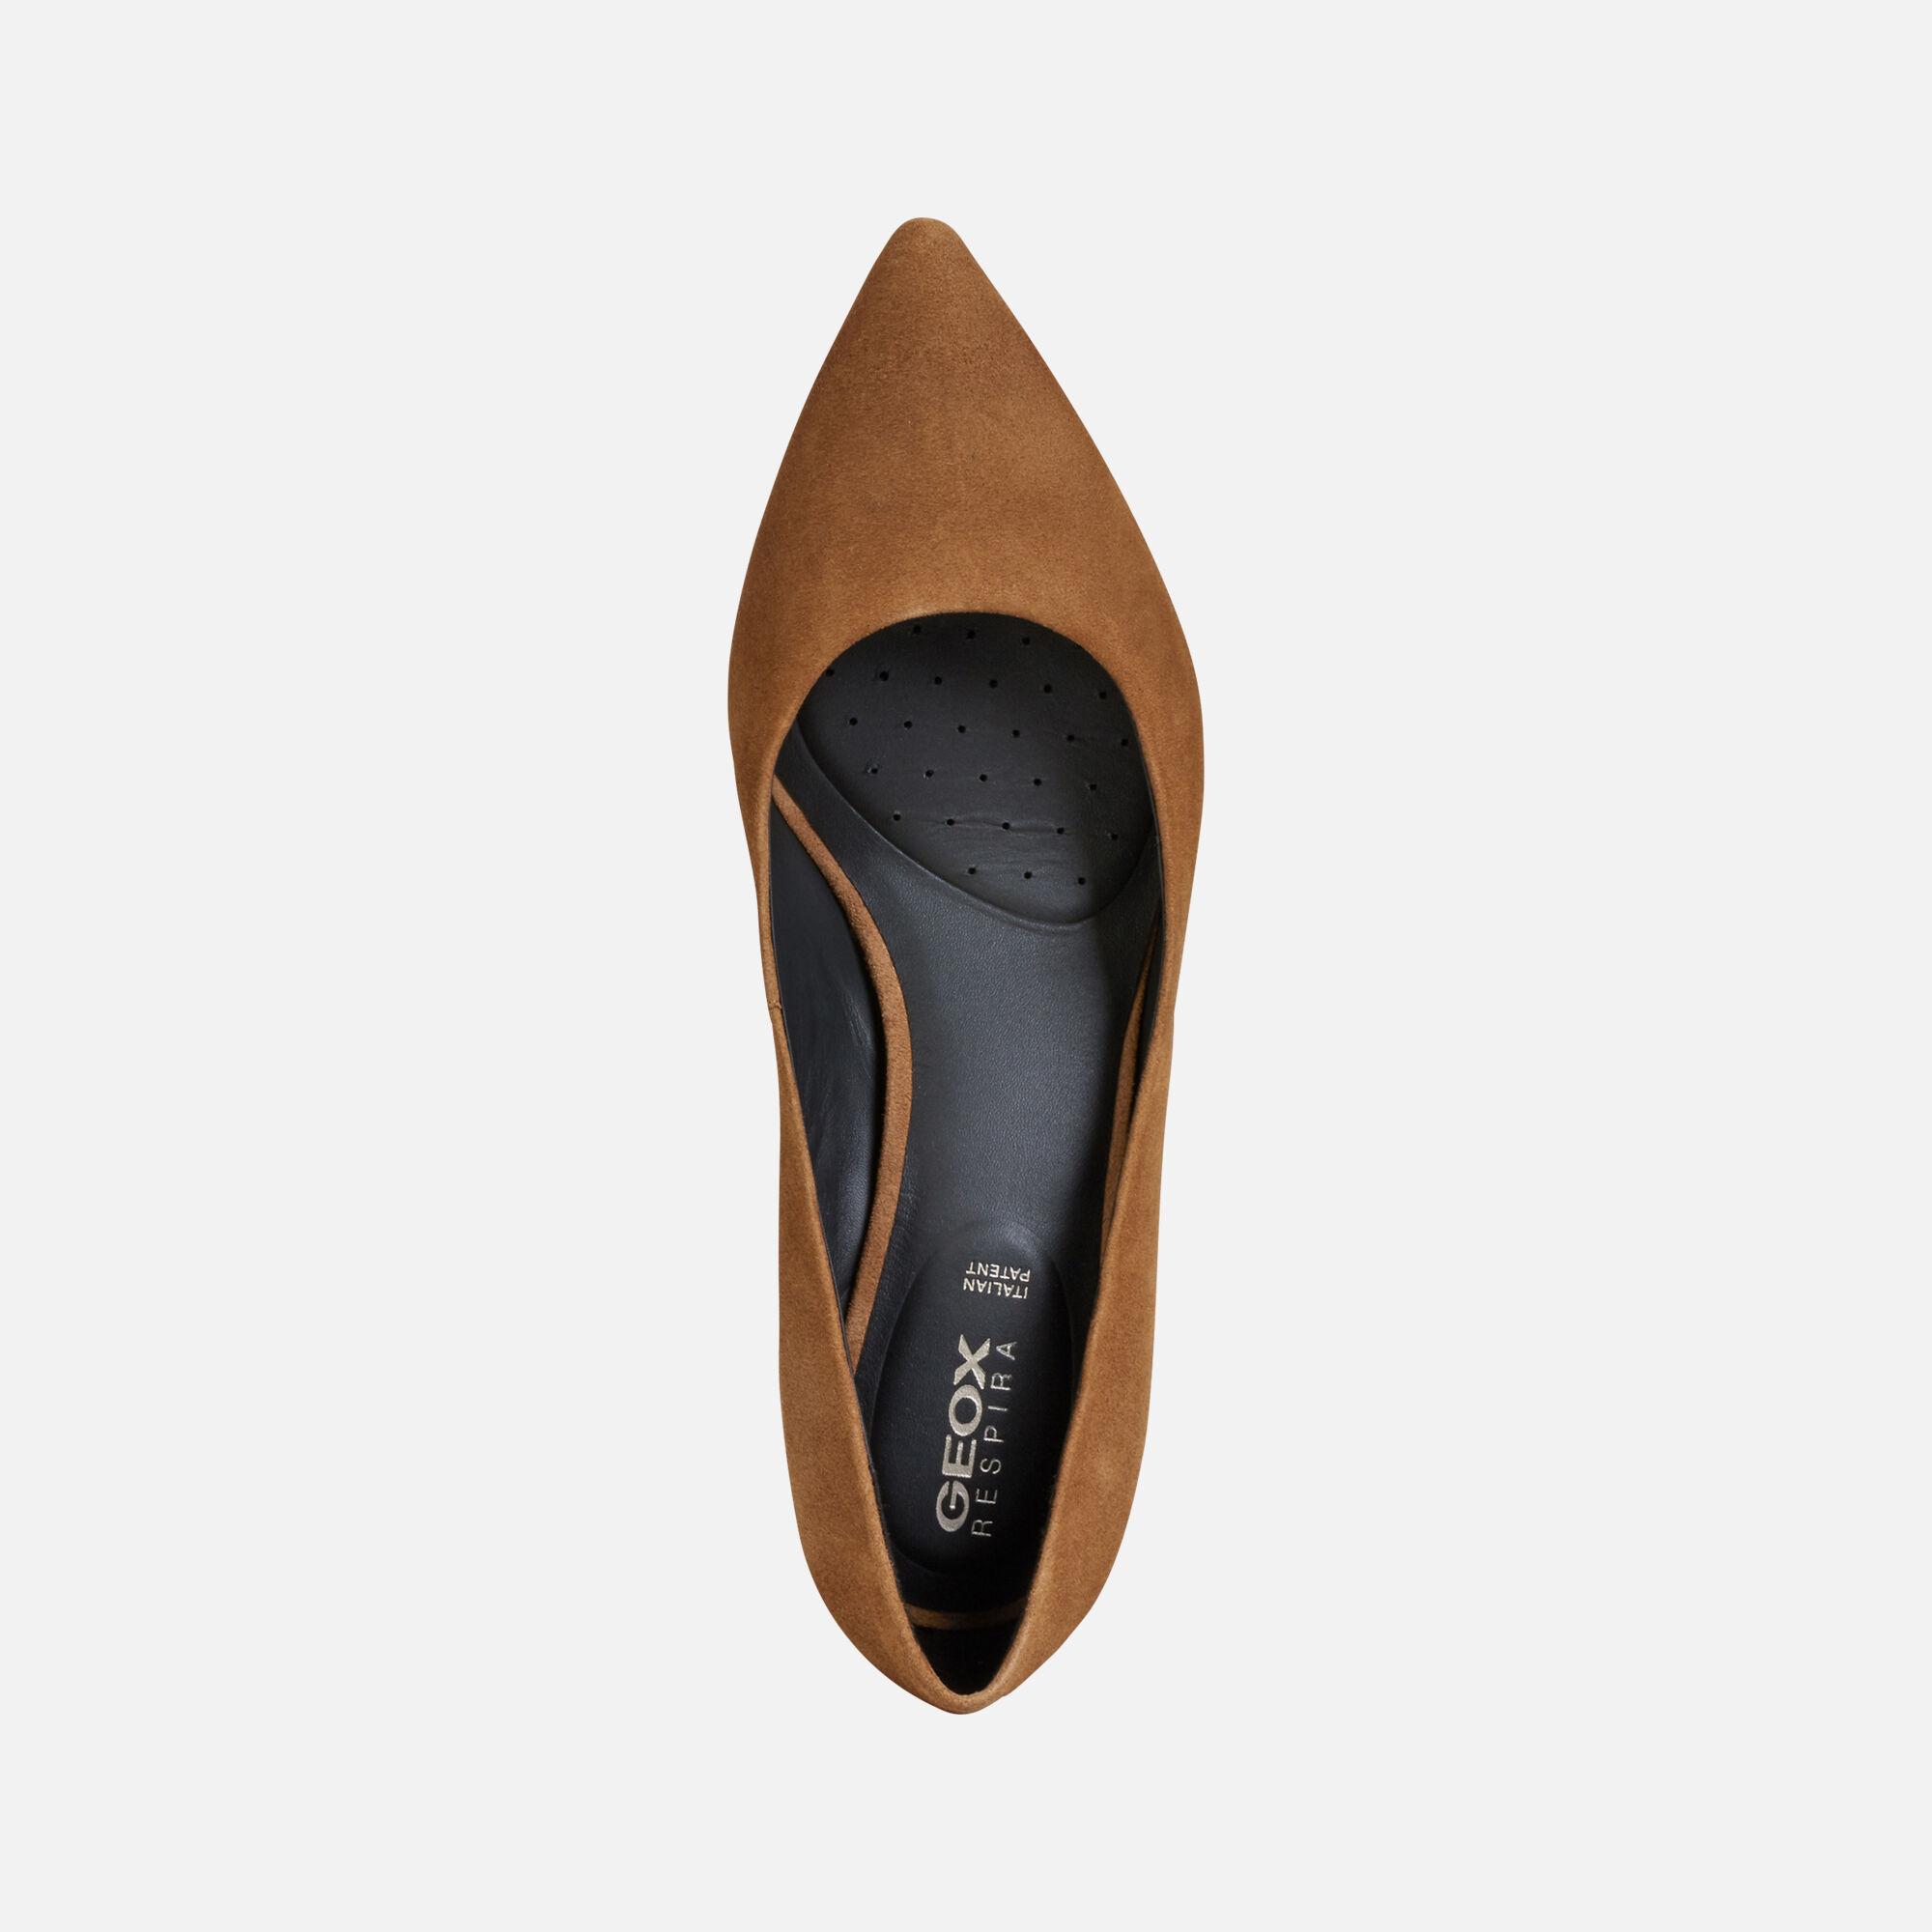 Geox BIBBIANA Femme Chaussures Tabac   Geox ® 1920